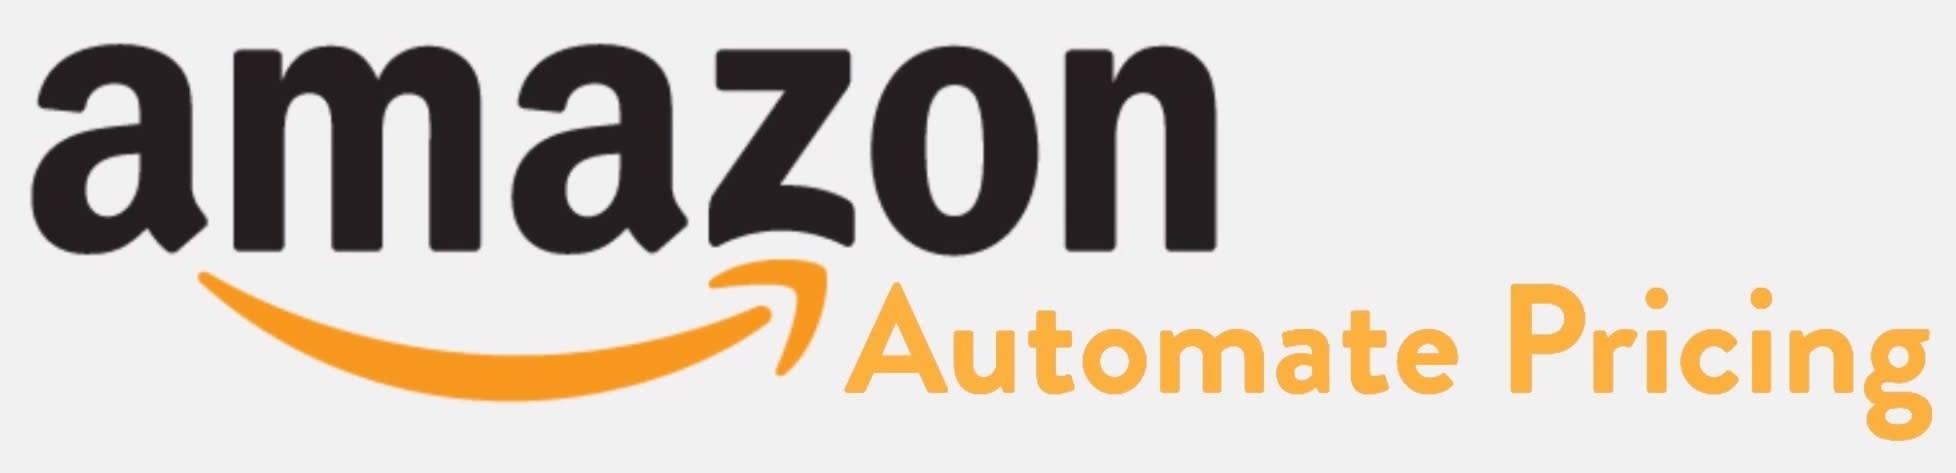 Amazon Automate Pricing logo